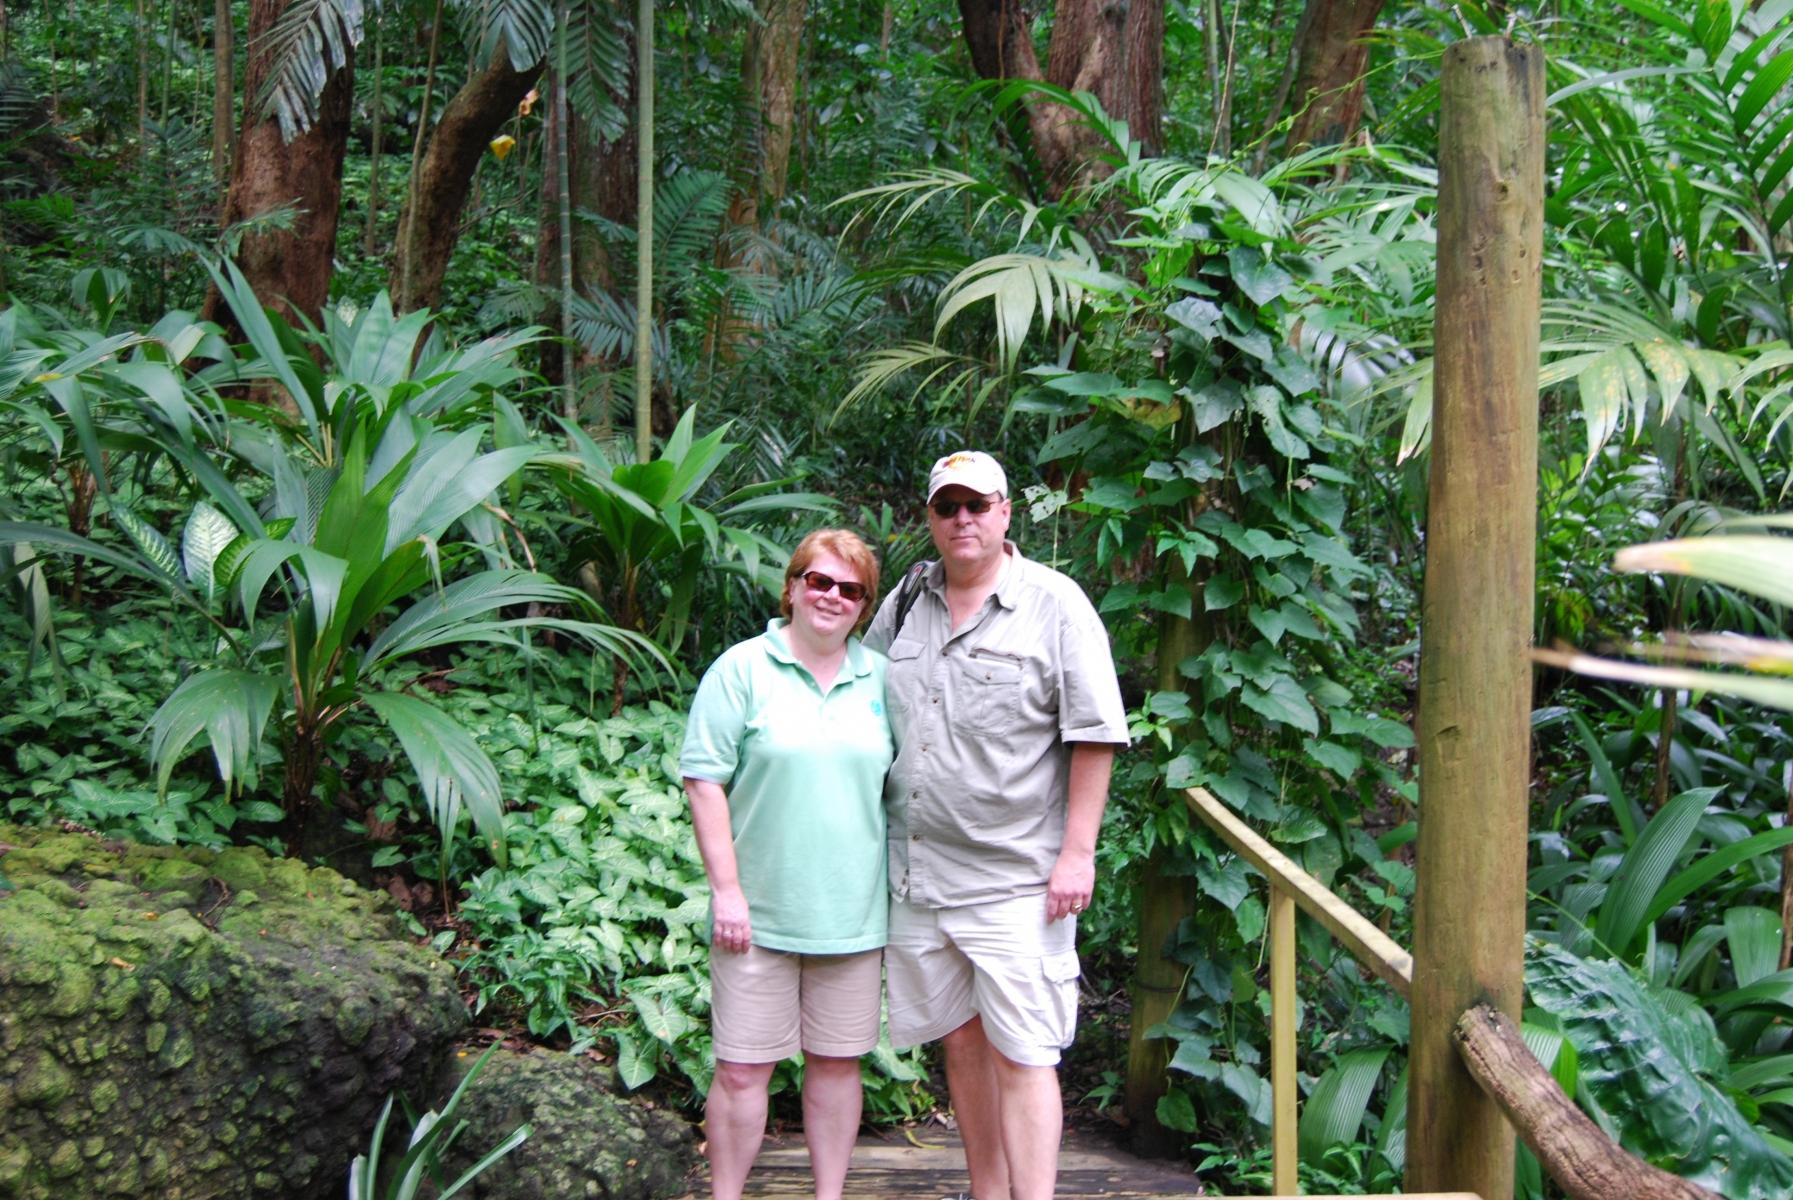 Garden-of-the-Sleeping-Giant-Fiji-2-2-2011-3-10-47-PM